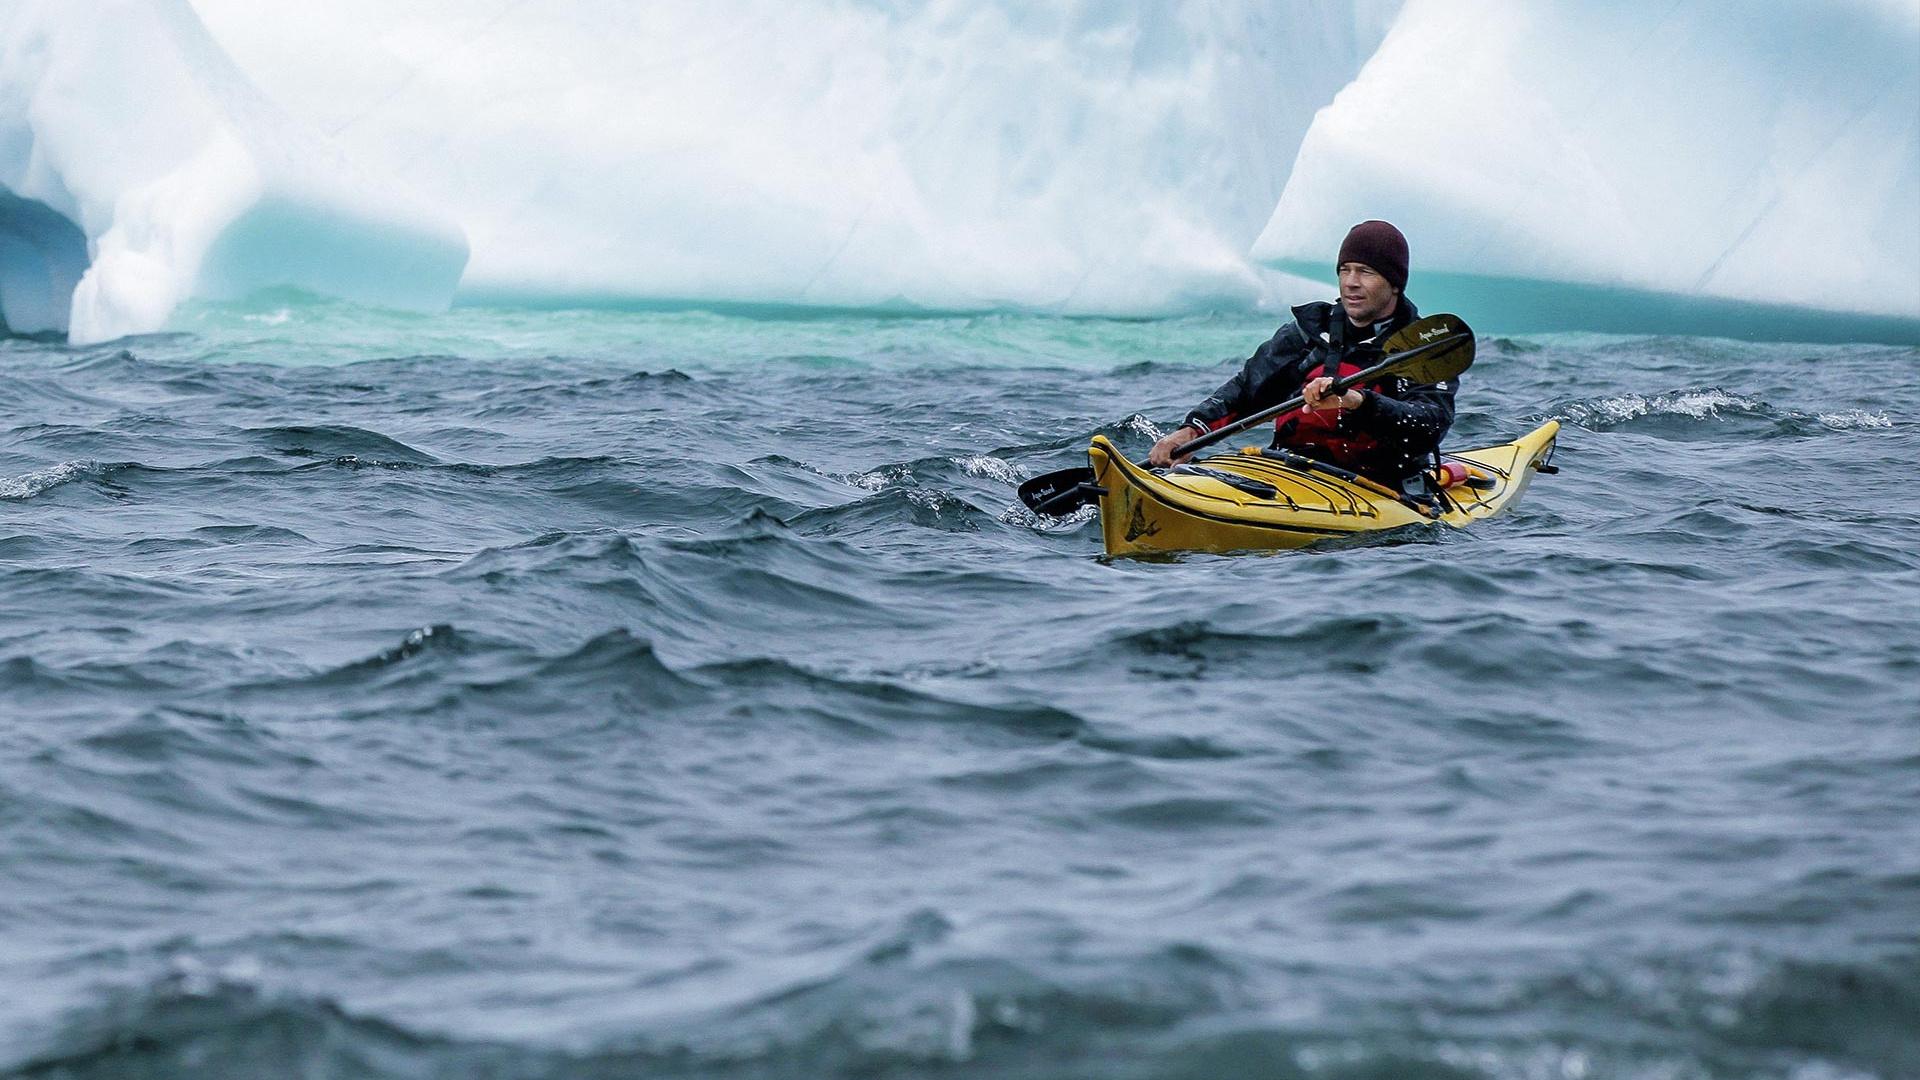 Kayaking in Newfoundland, Canada